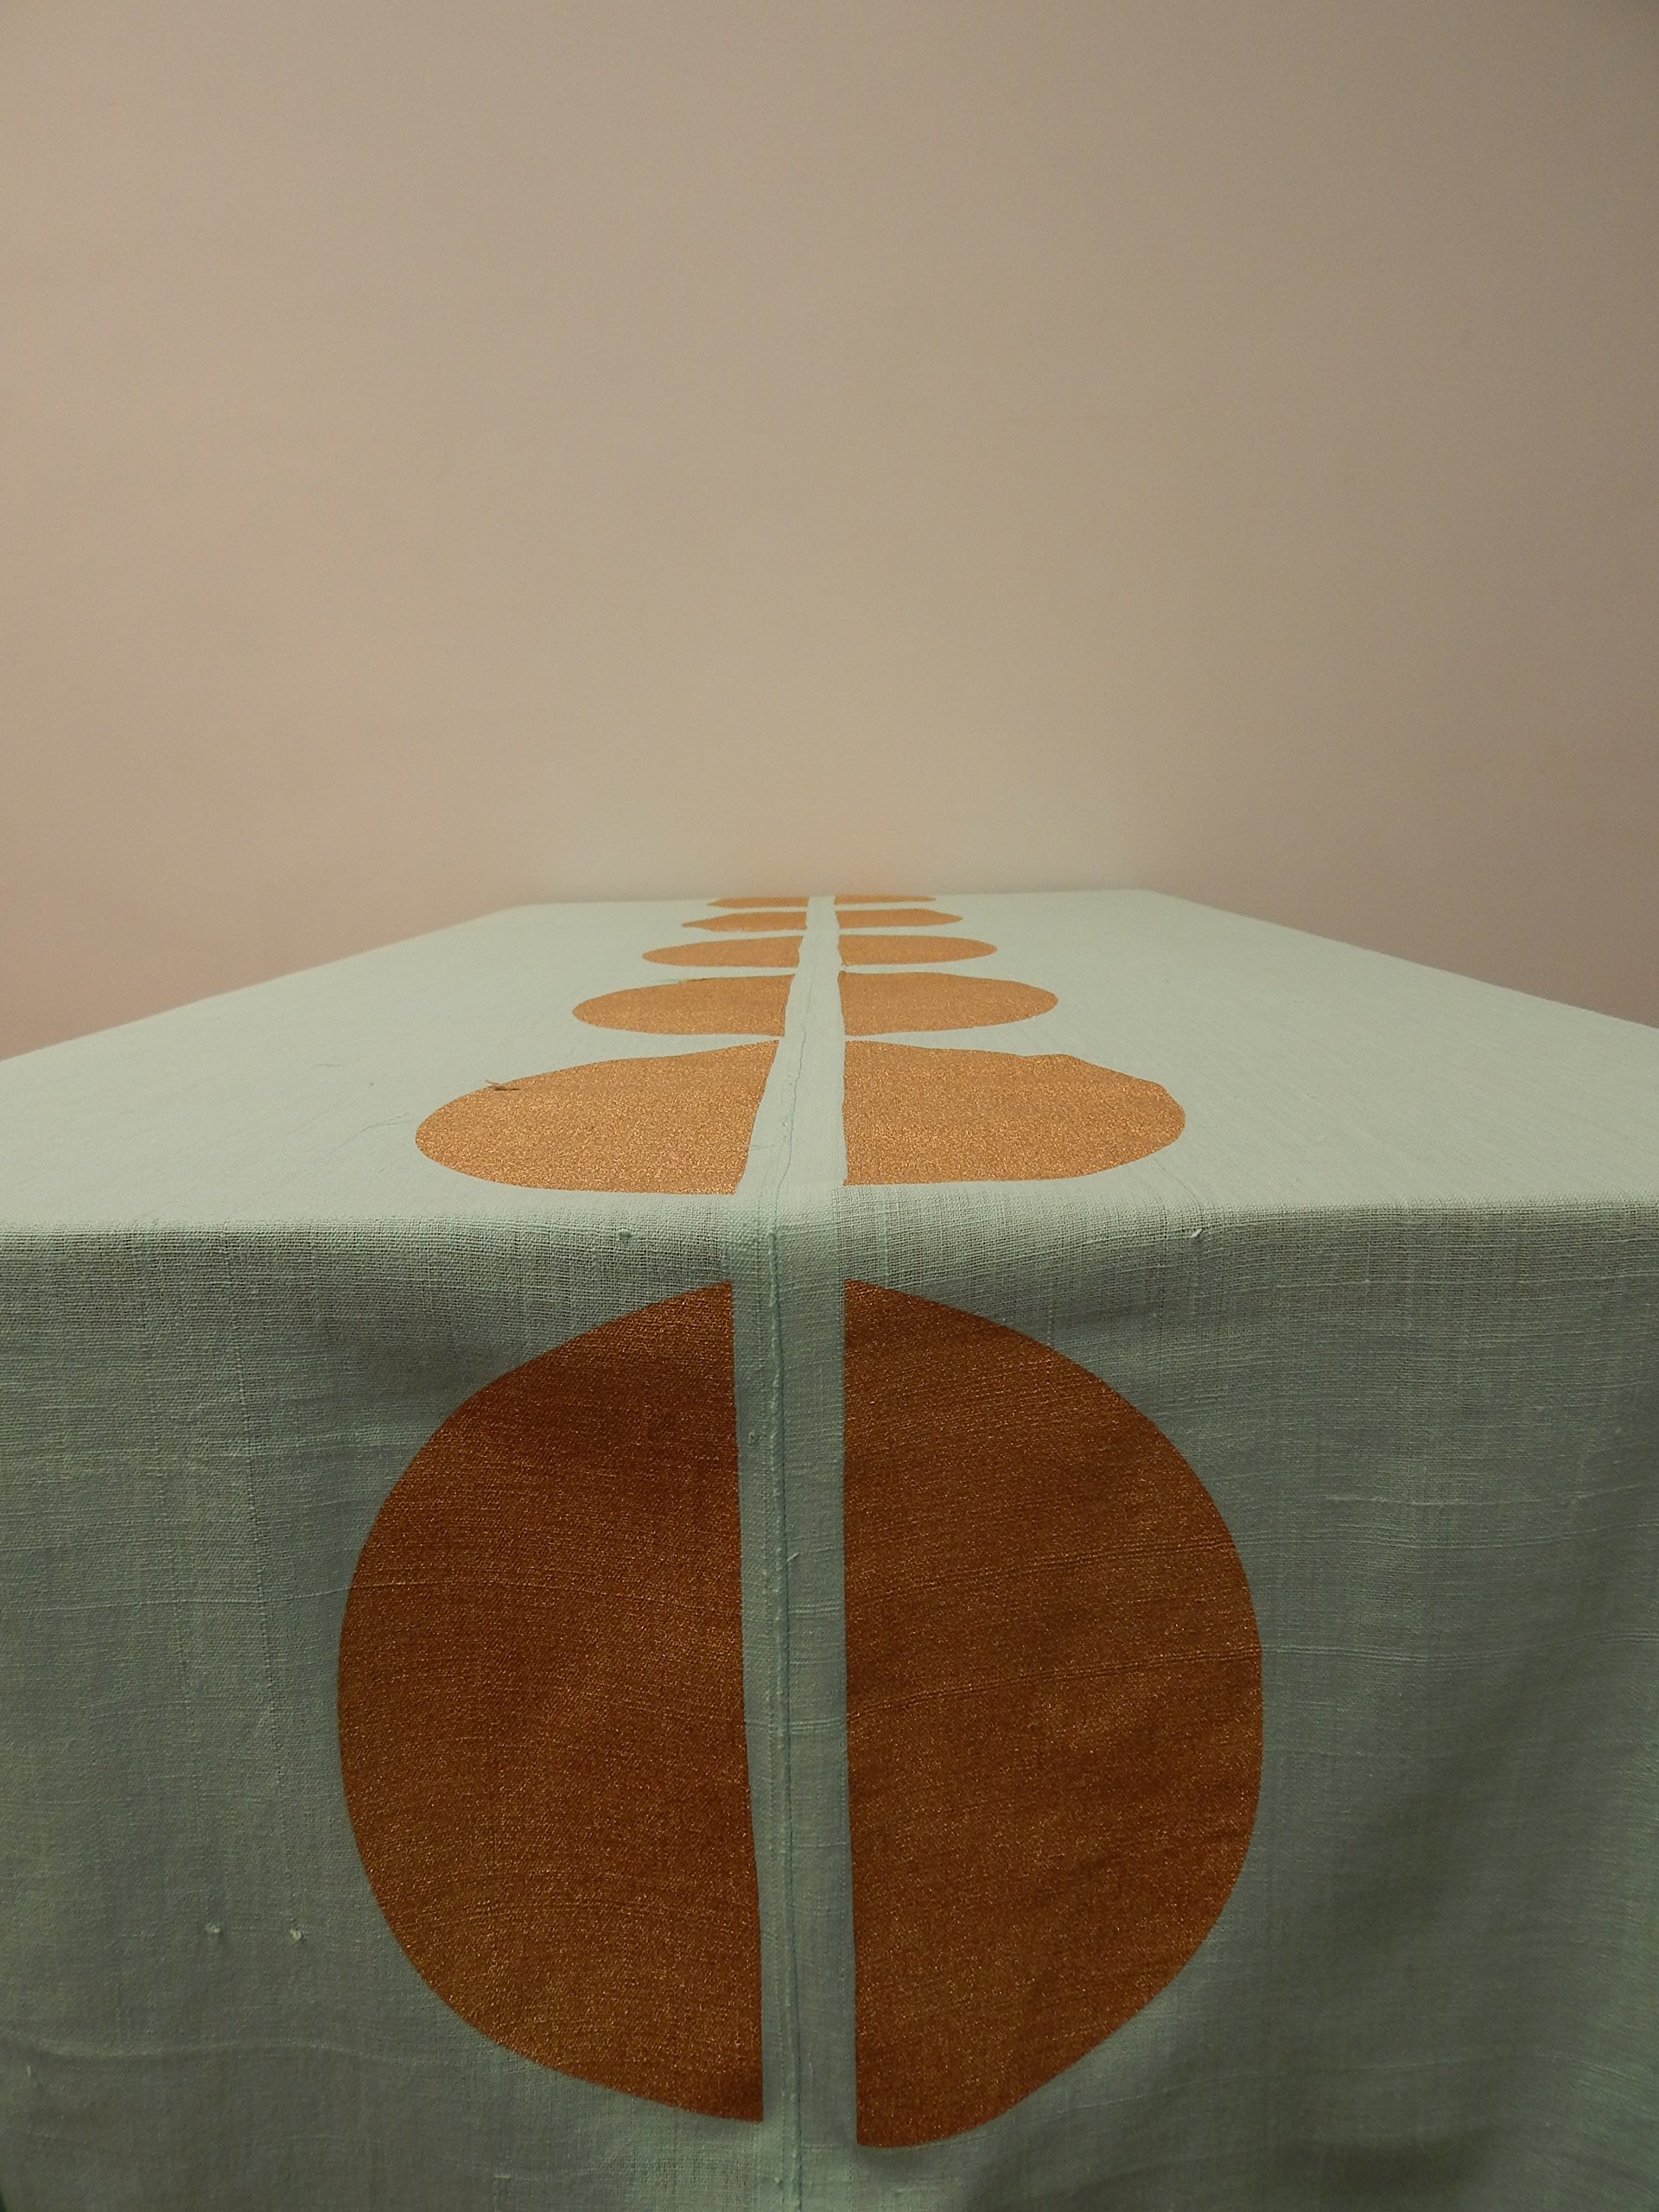 Gitika Goyal Home Cotton Khadi Gold Screen Printed Tablecloth with Dot Design, Blue, 72'' x 72''